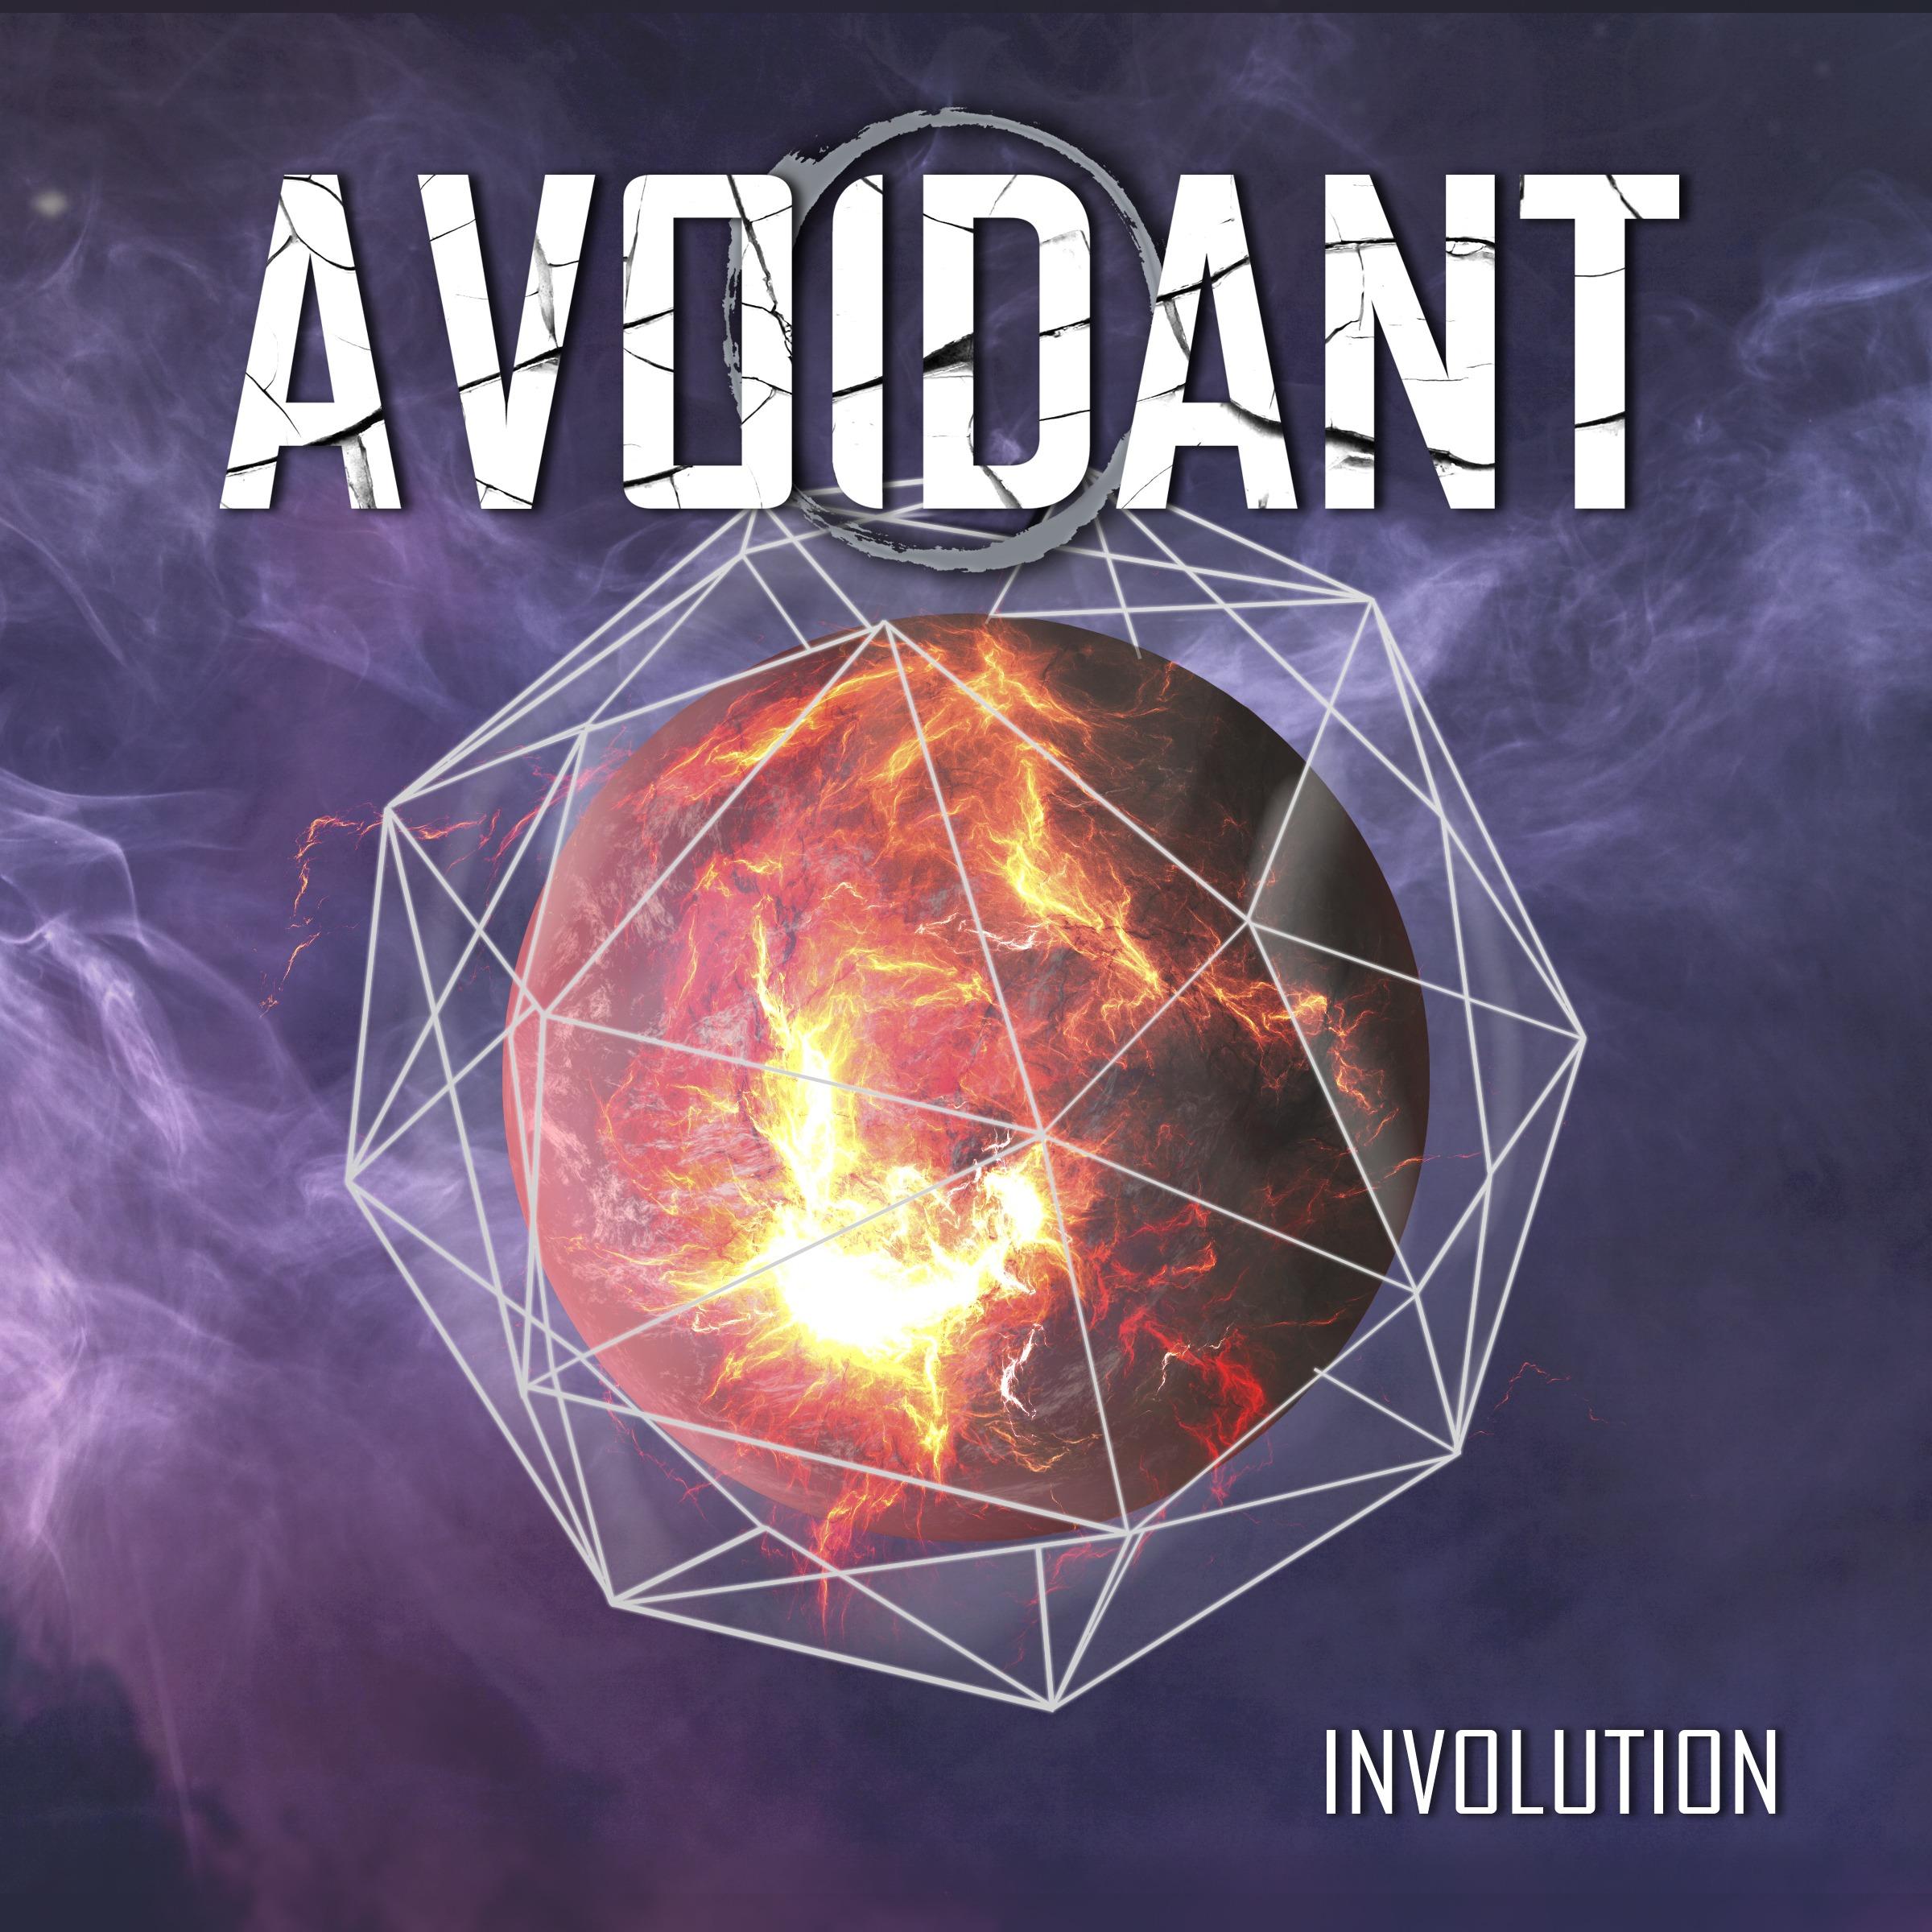 AVOIDANT (PER) – Involution EP, 2013